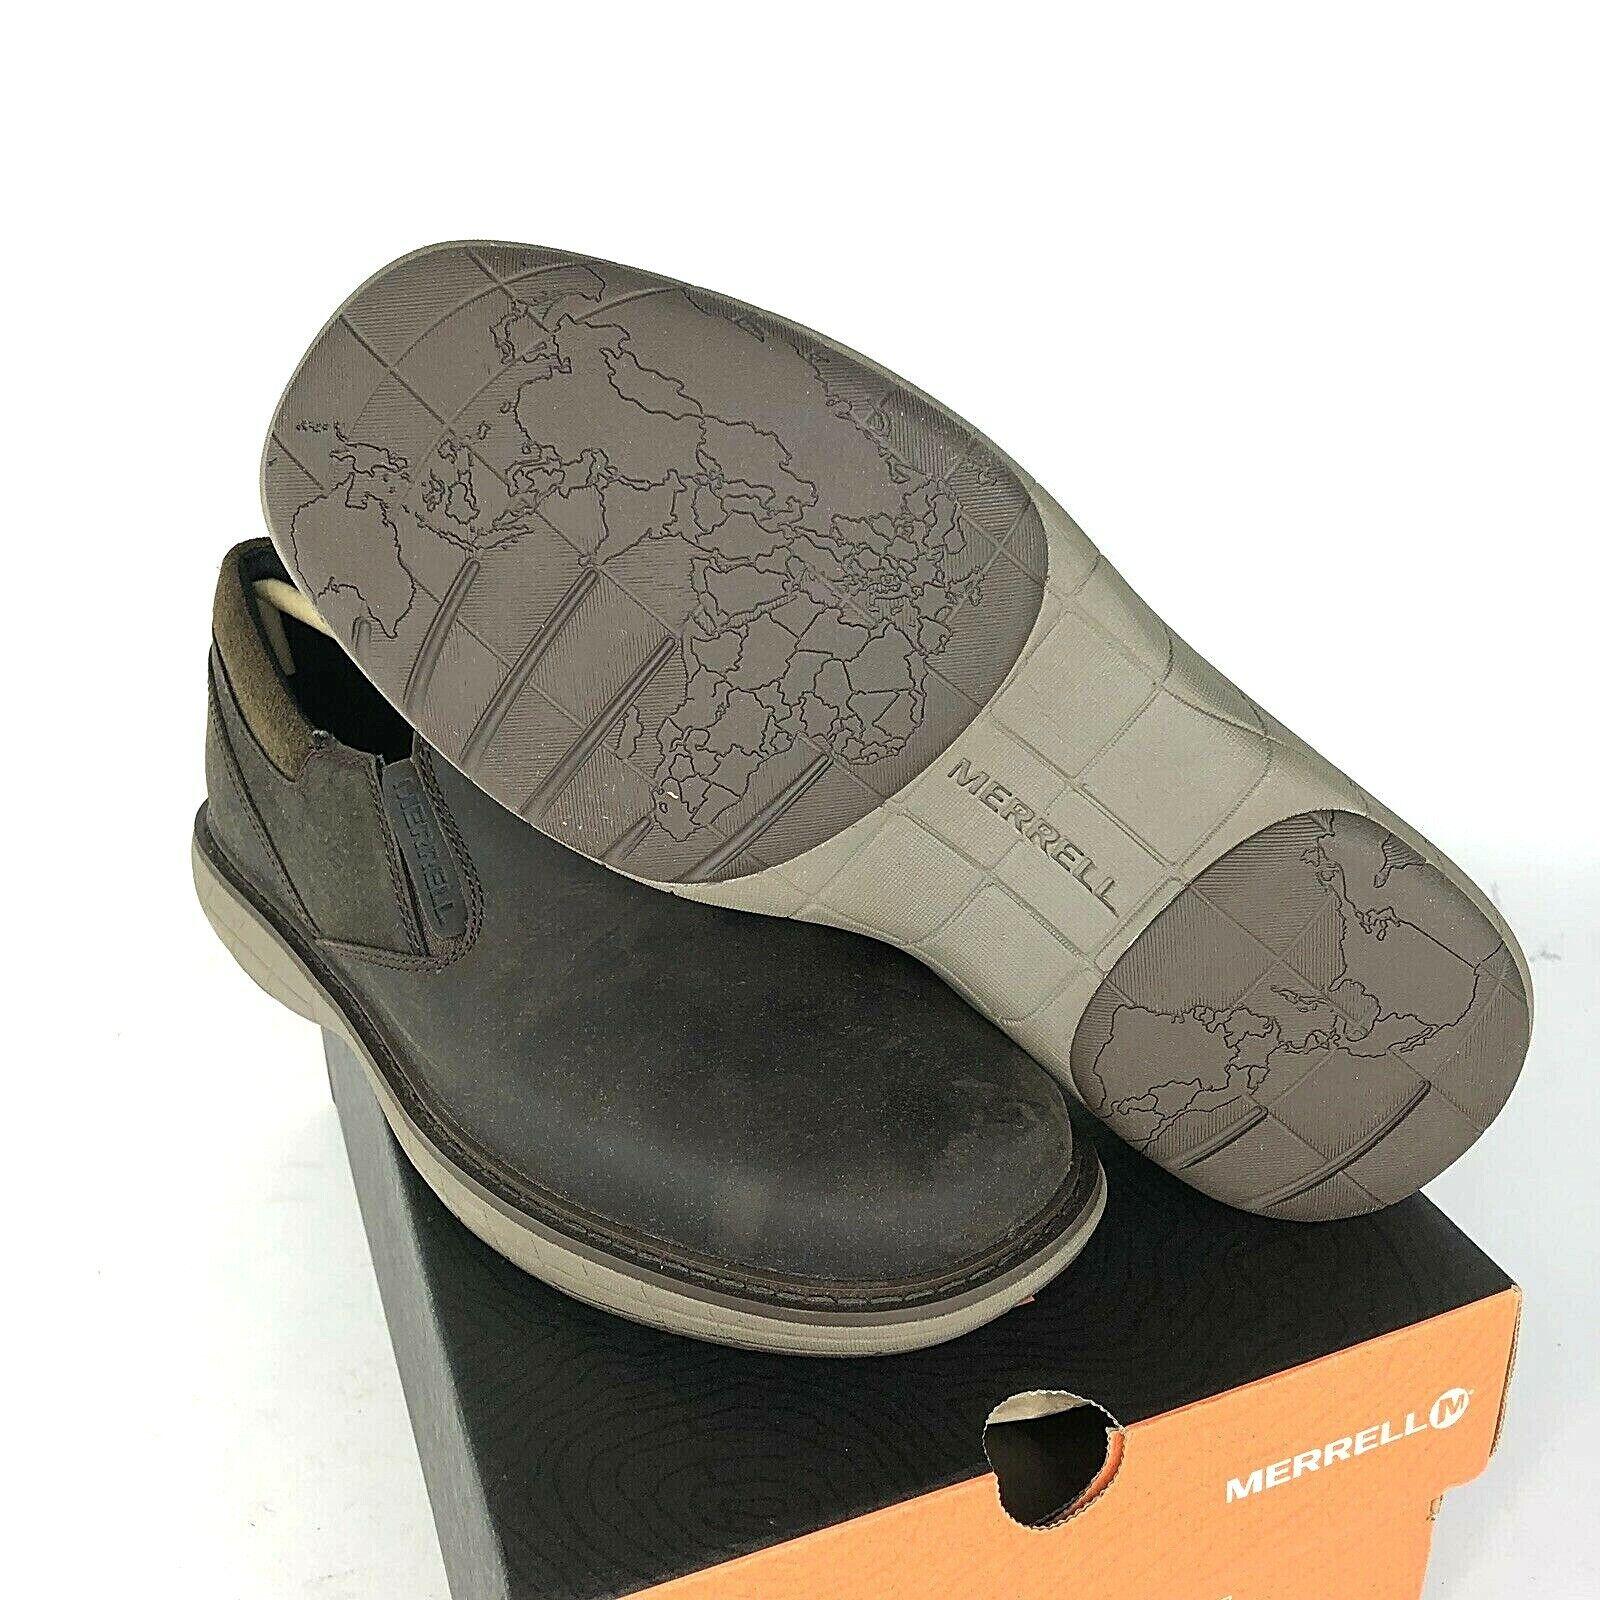 Tienda 2018 Merrell Hombre Talla 8 Vue Moc Tenis Zapatos De